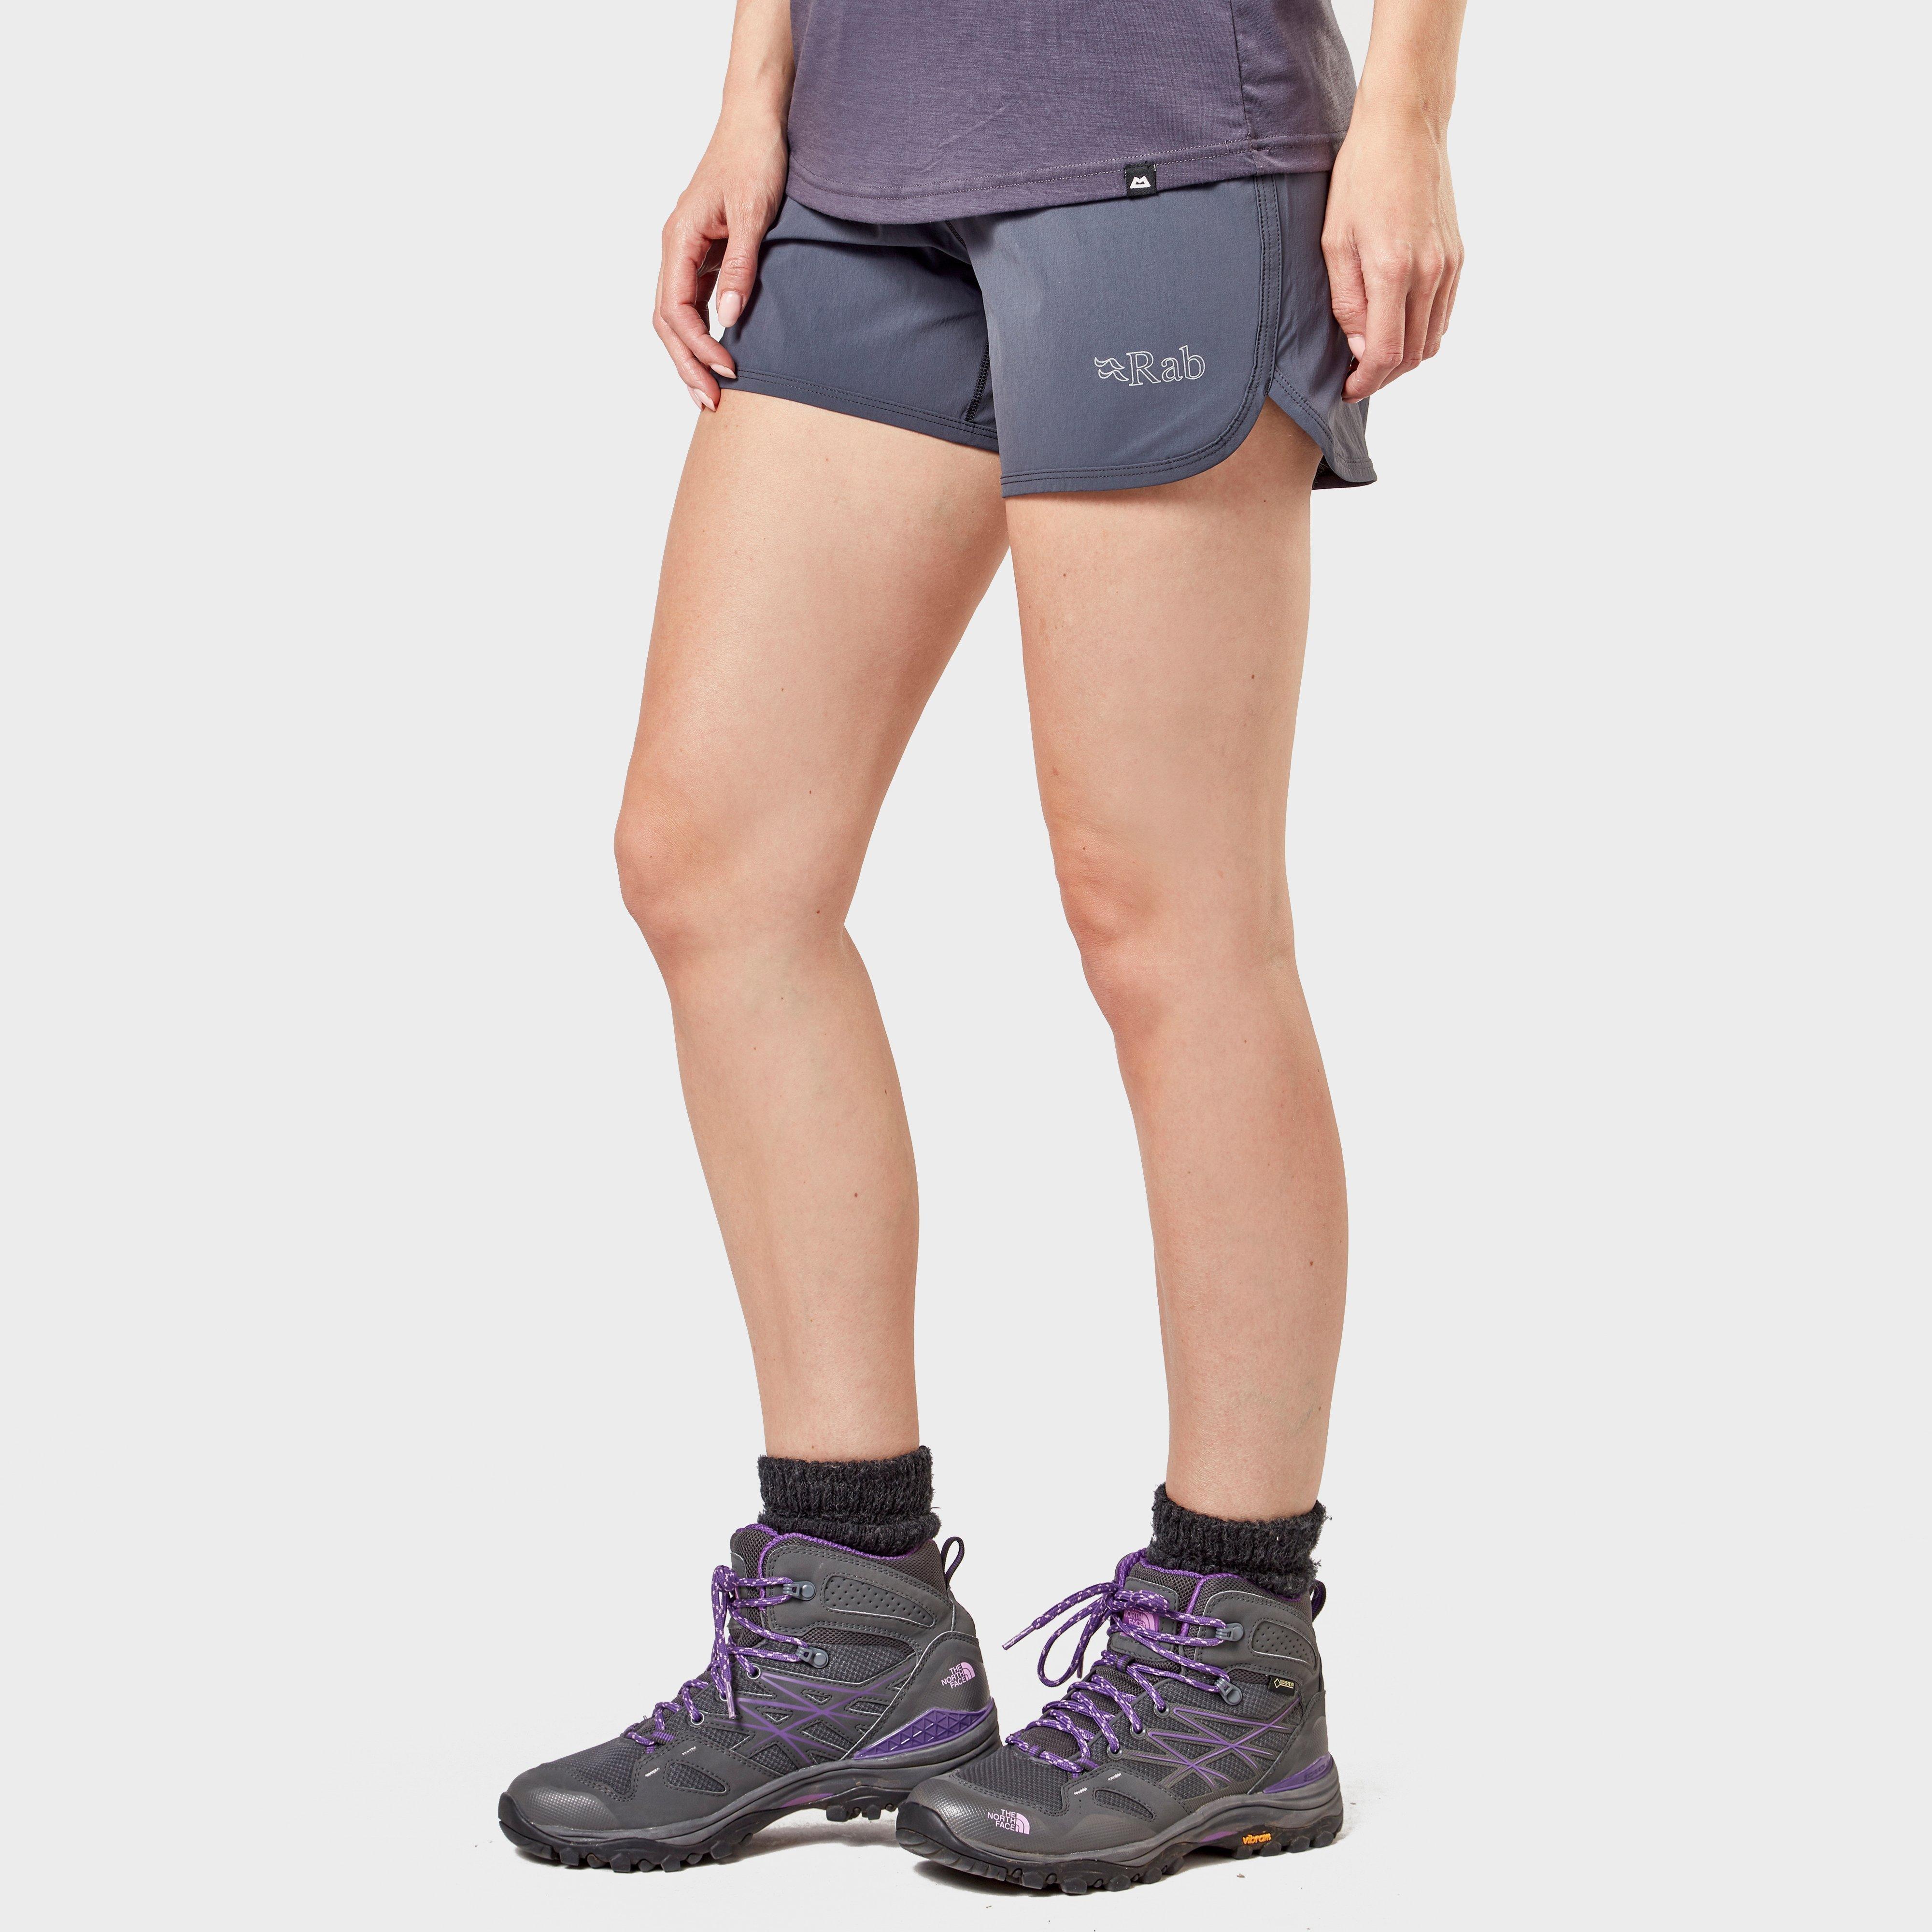 Rab Women's Momentum Shorts, MID GREY/WMNS